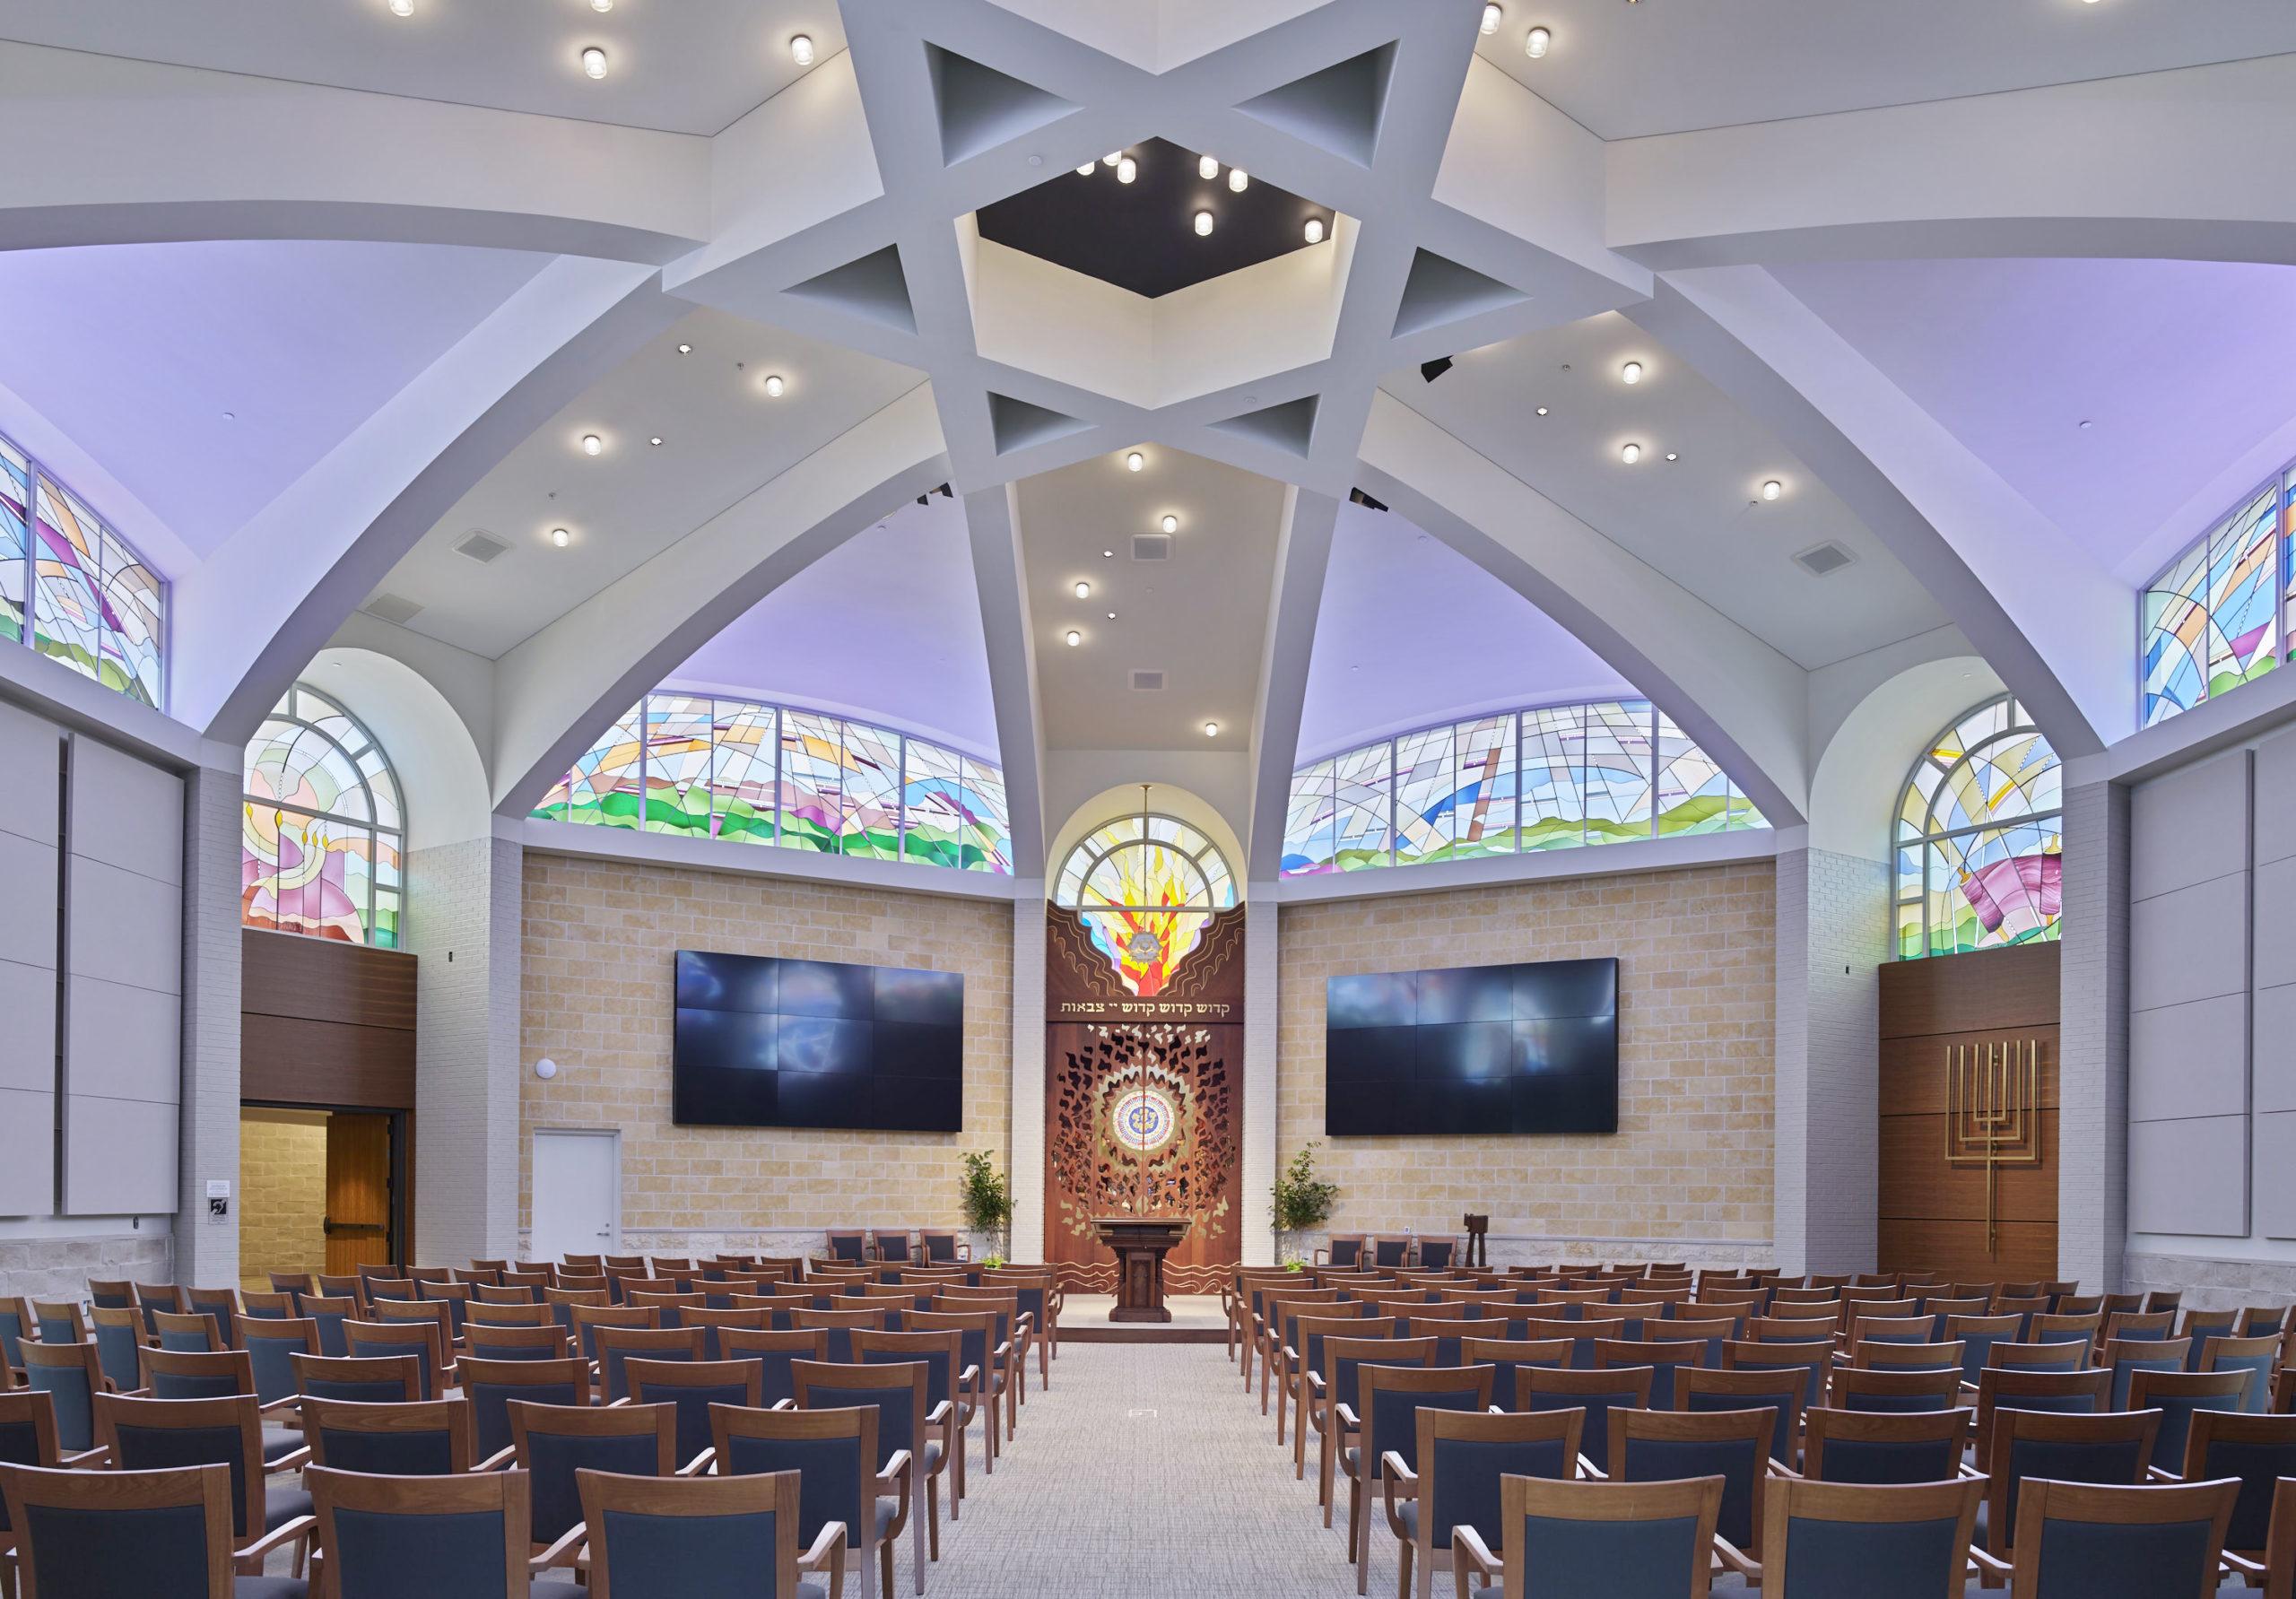 The Temple, Congregation B'nai Jehudah